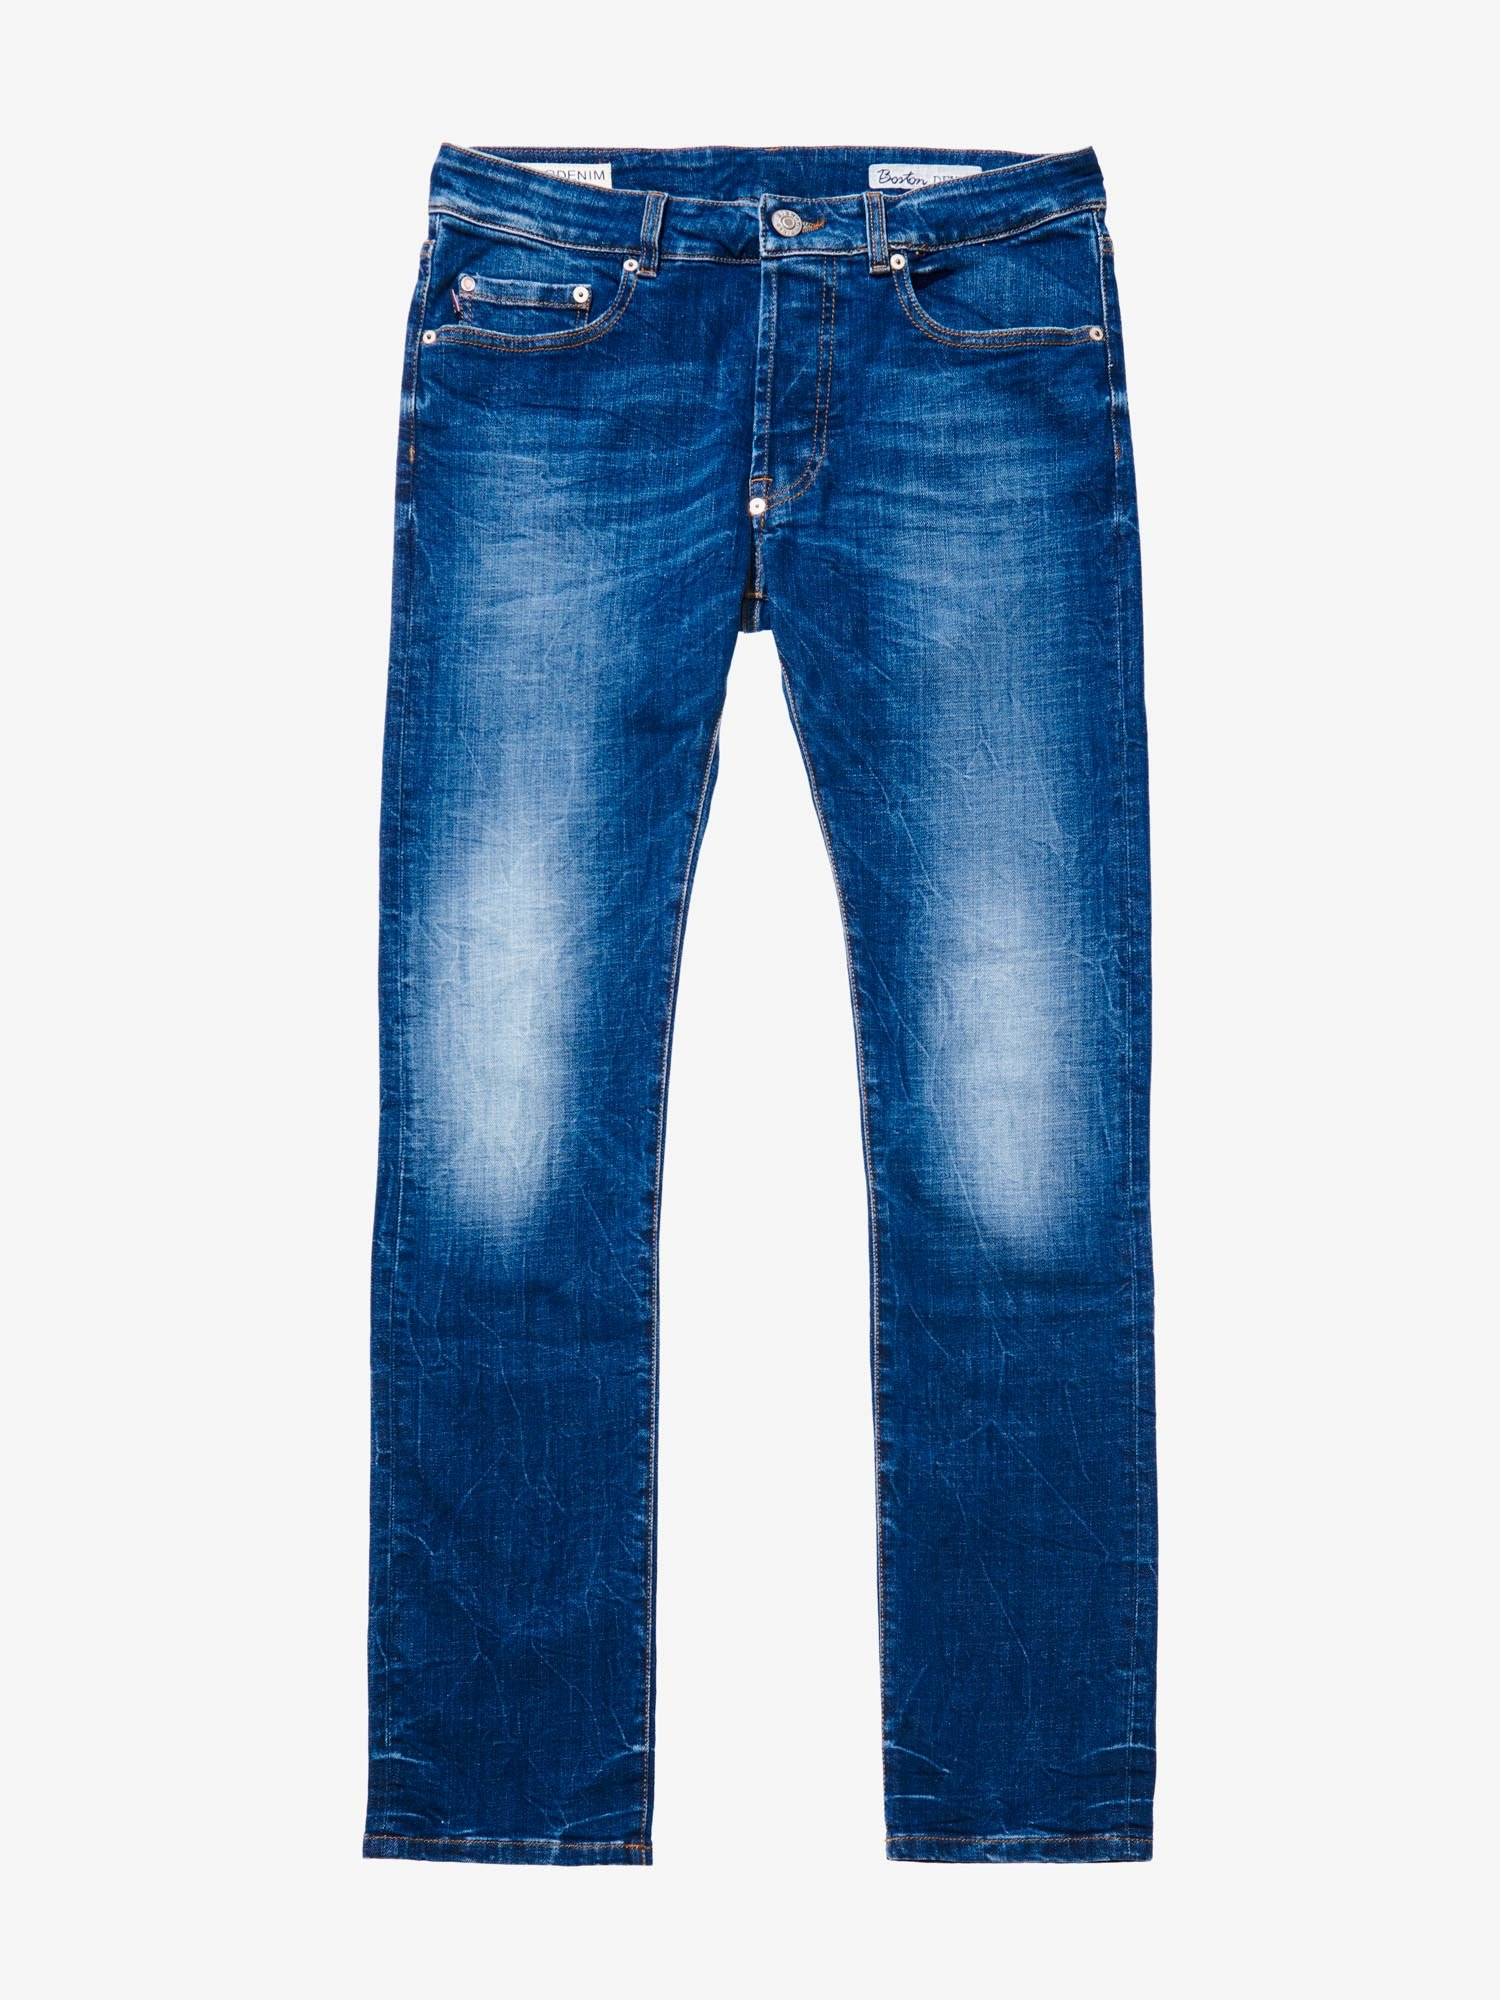 Blauer - DENIMHOSE BOOT CUT STONE WASHED - Denim Washing - Blauer